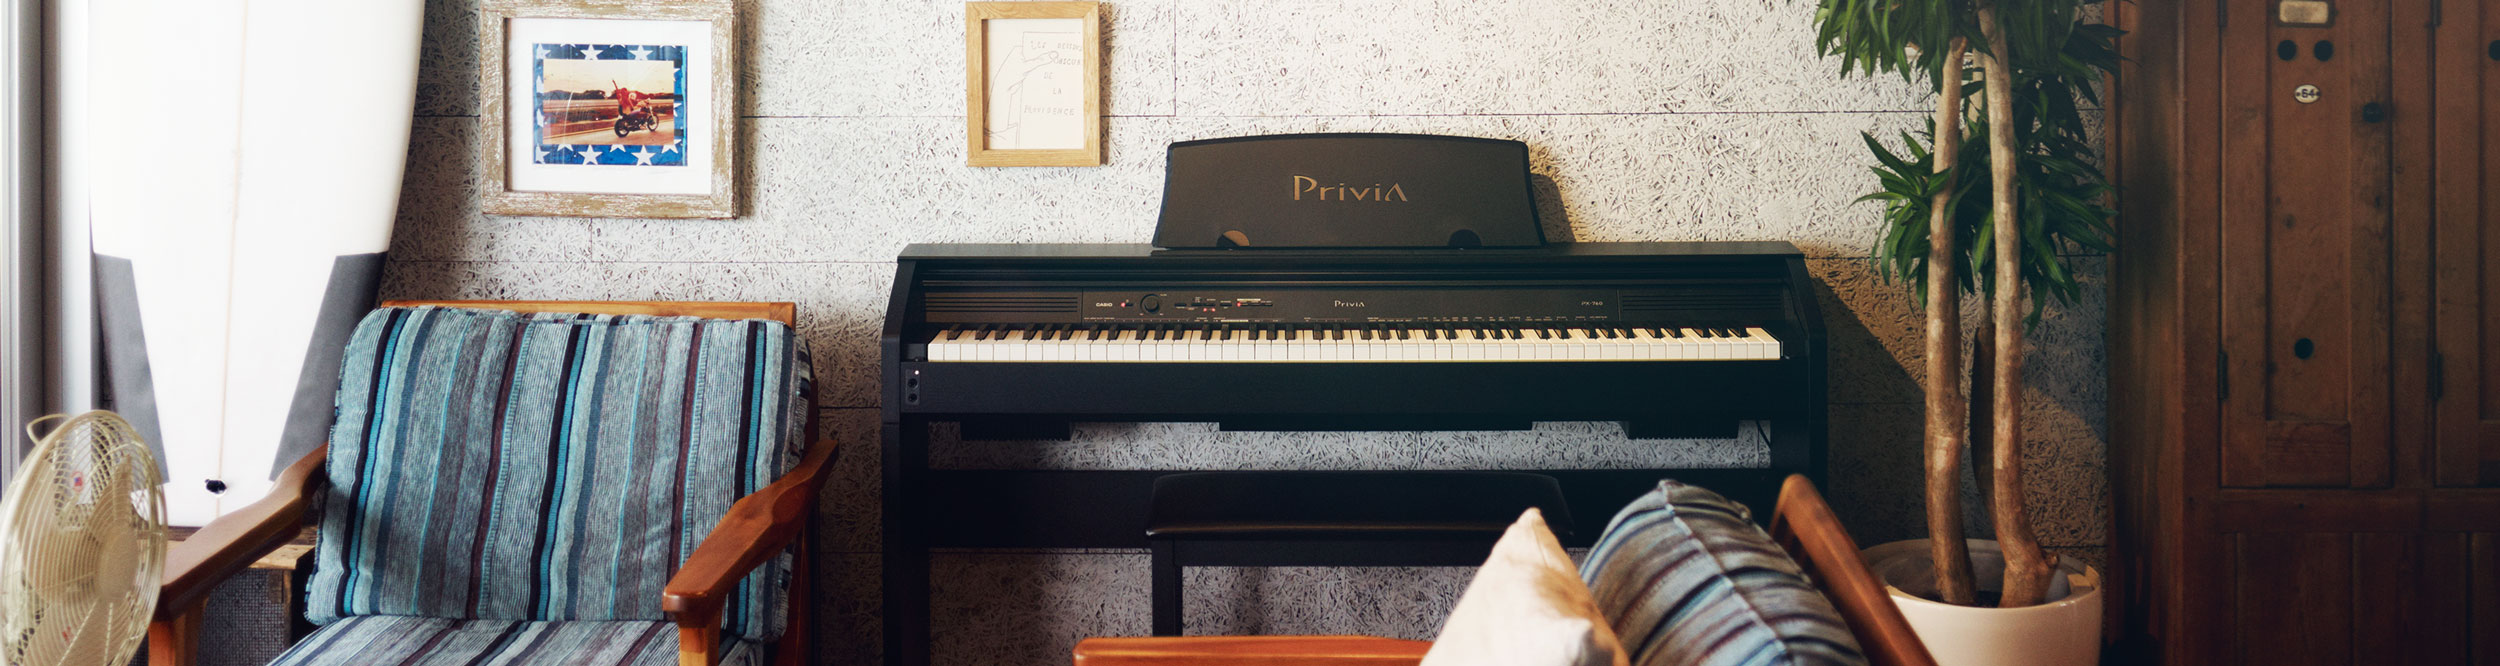 PRIVIA® COMPACT LIVING PIANOS -